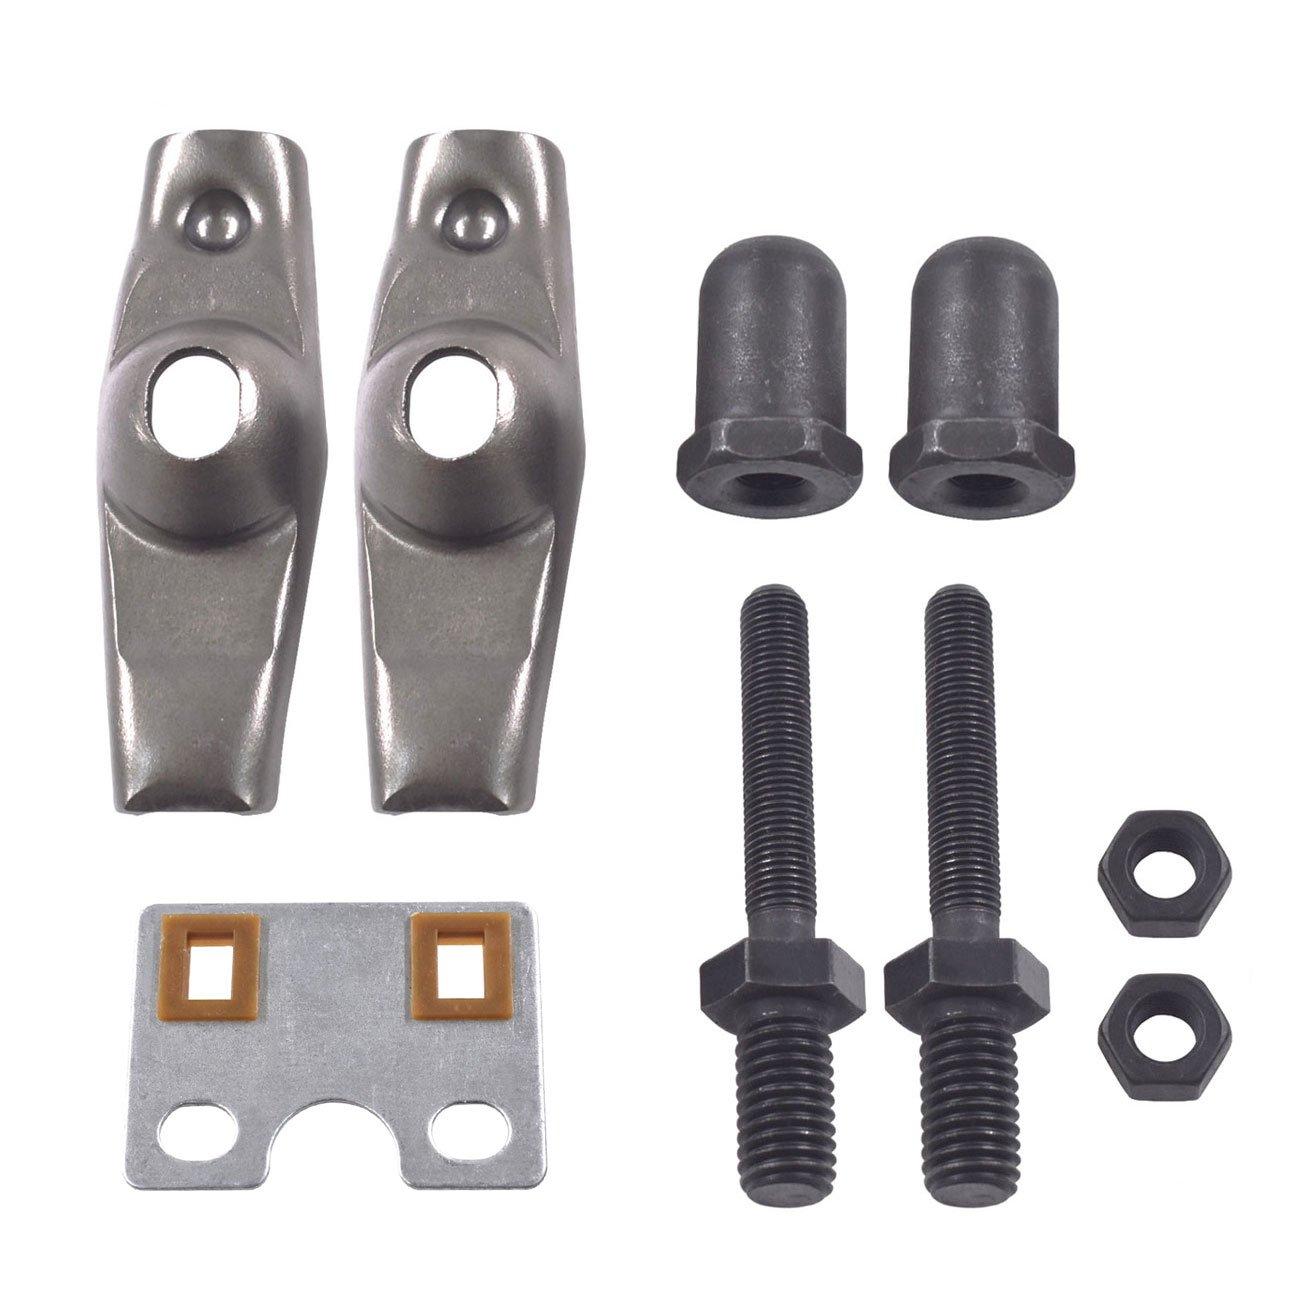 JRL Valve Rocker Arm Push Rod Guide Plate fit Honda GX340 GX390 11HP 13HP Engine Huang Machinery